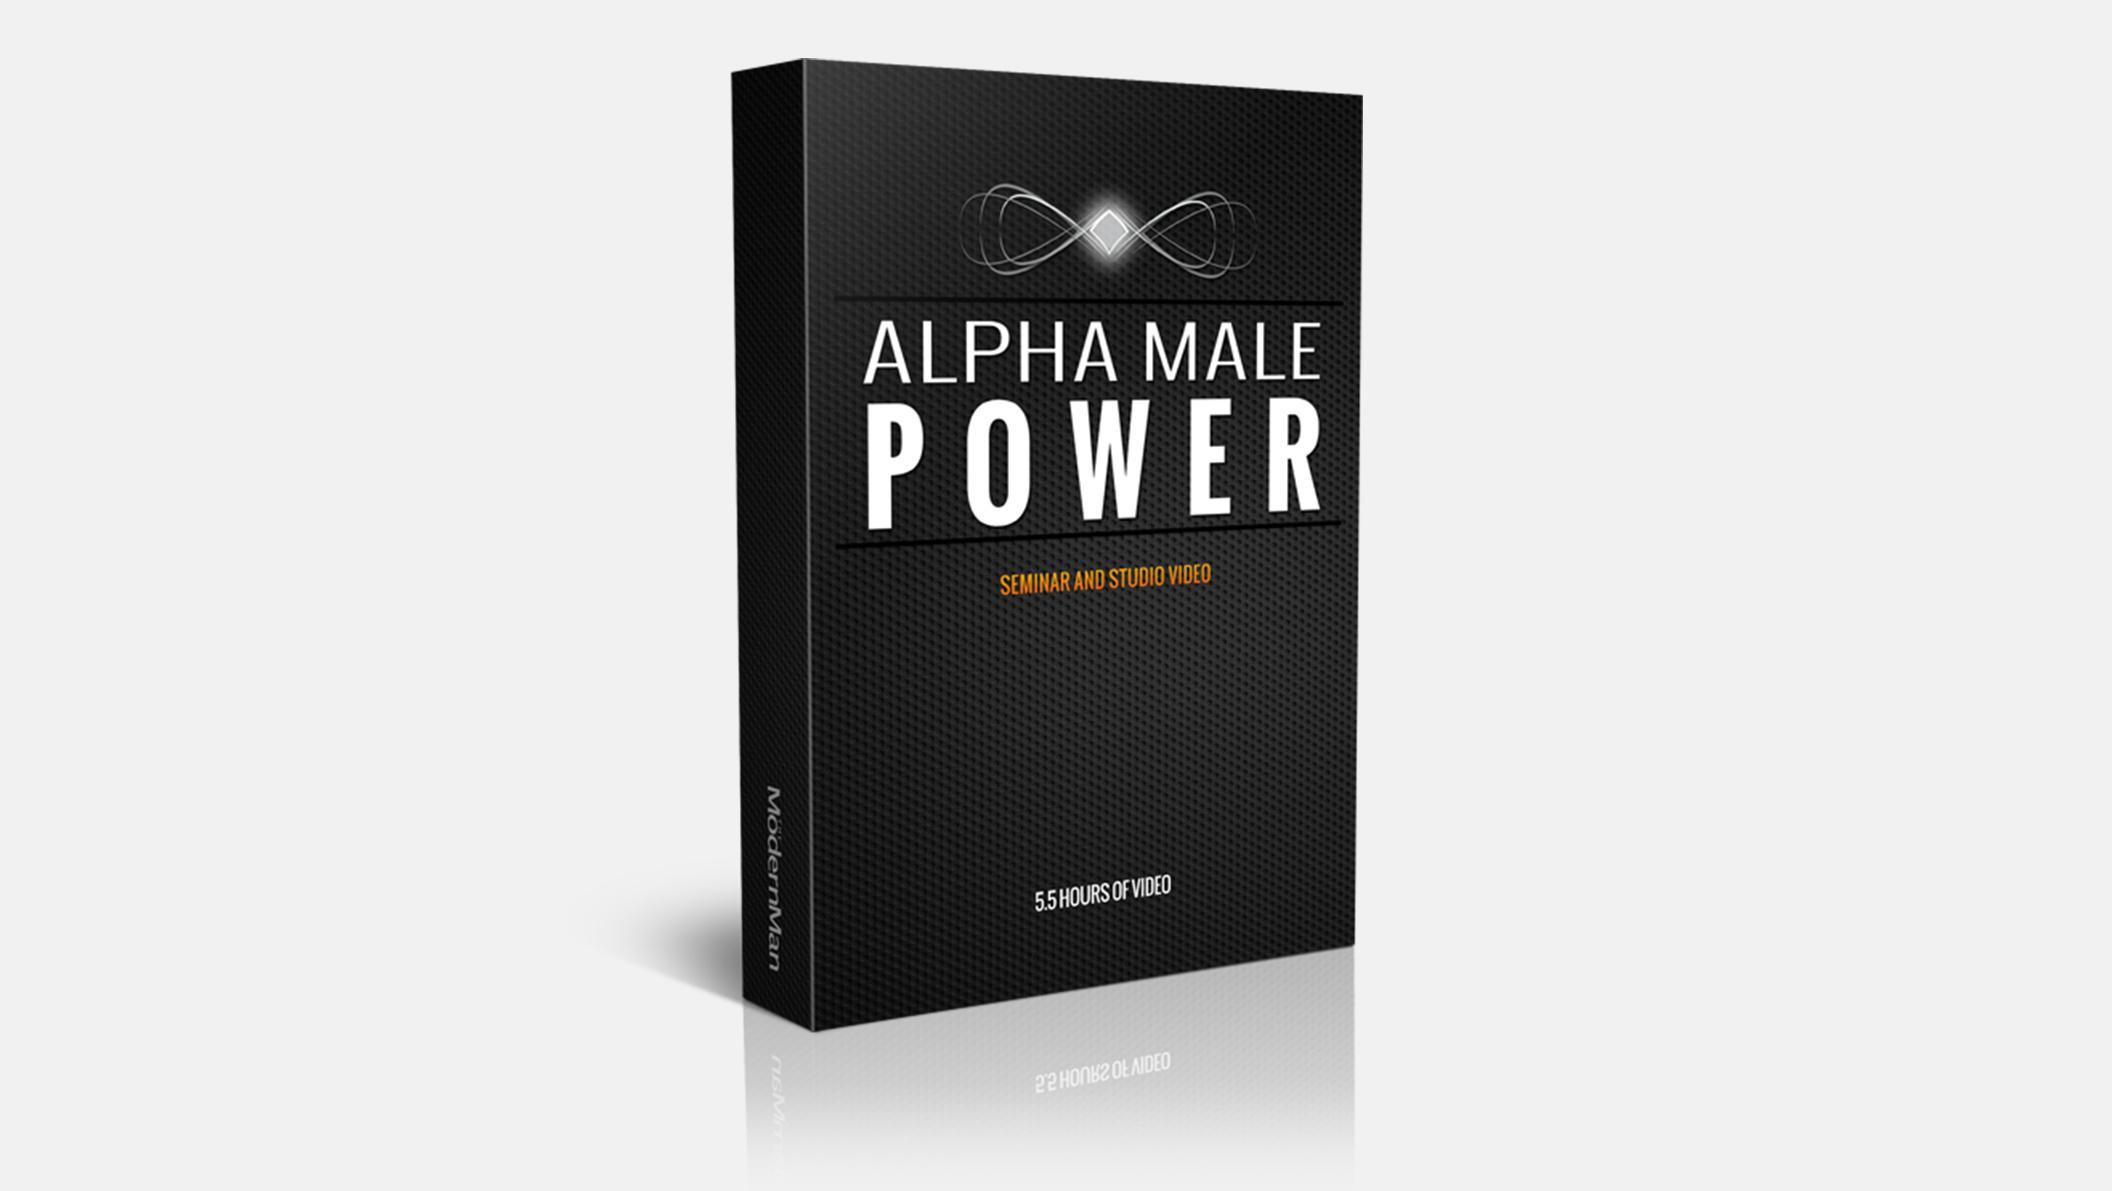 Alpha Male Power